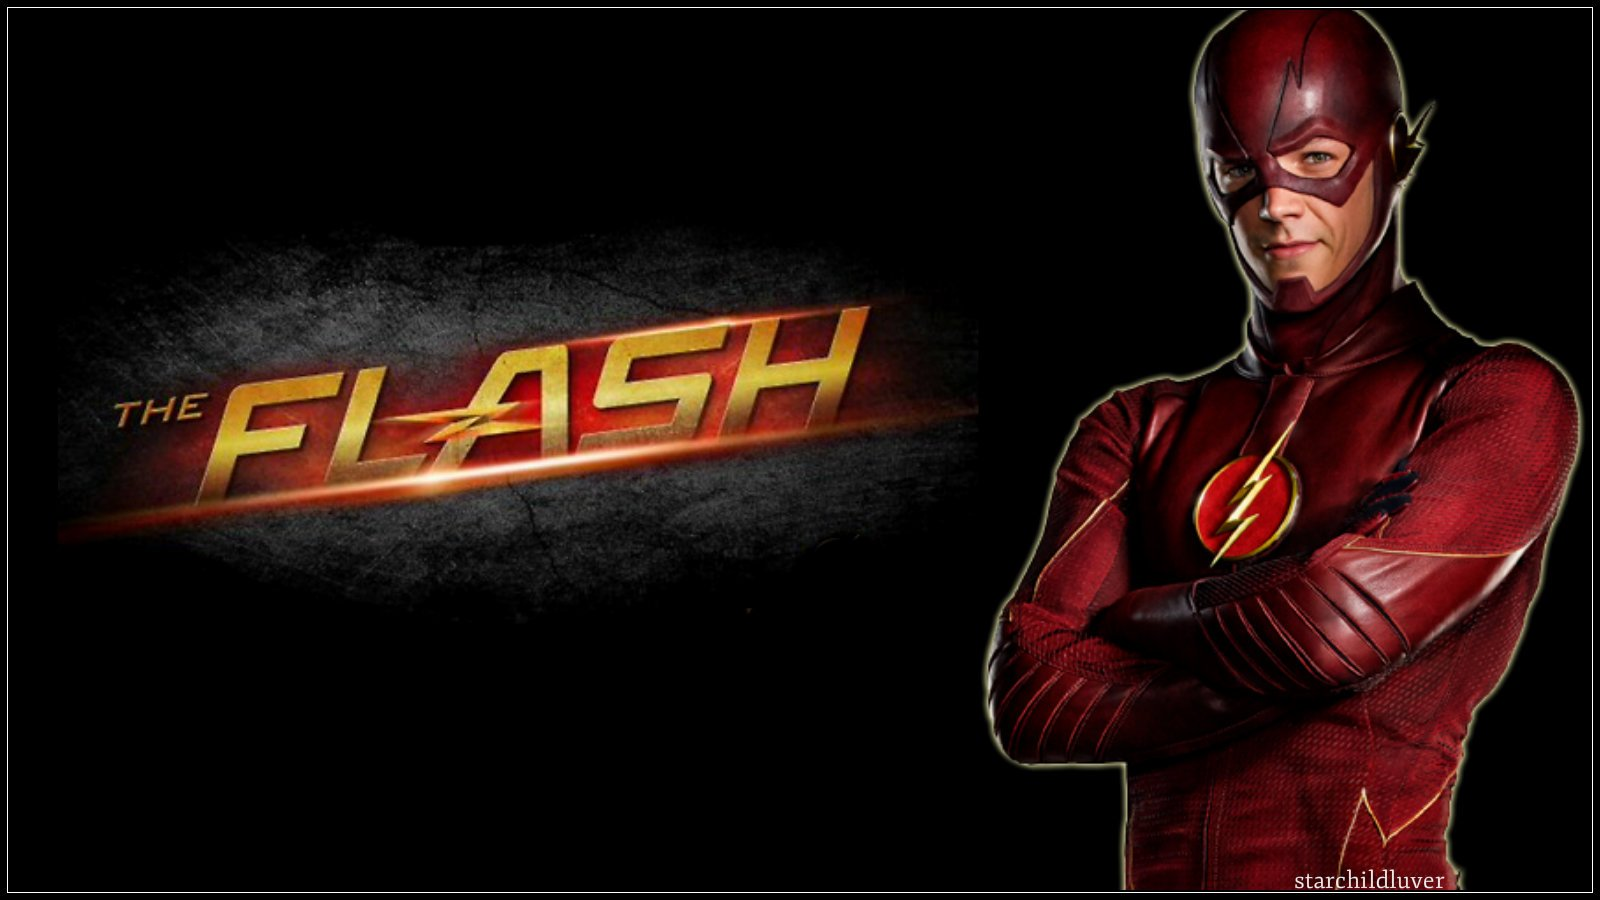 The Flash And Arrow Wallpaper Wallpapersafari